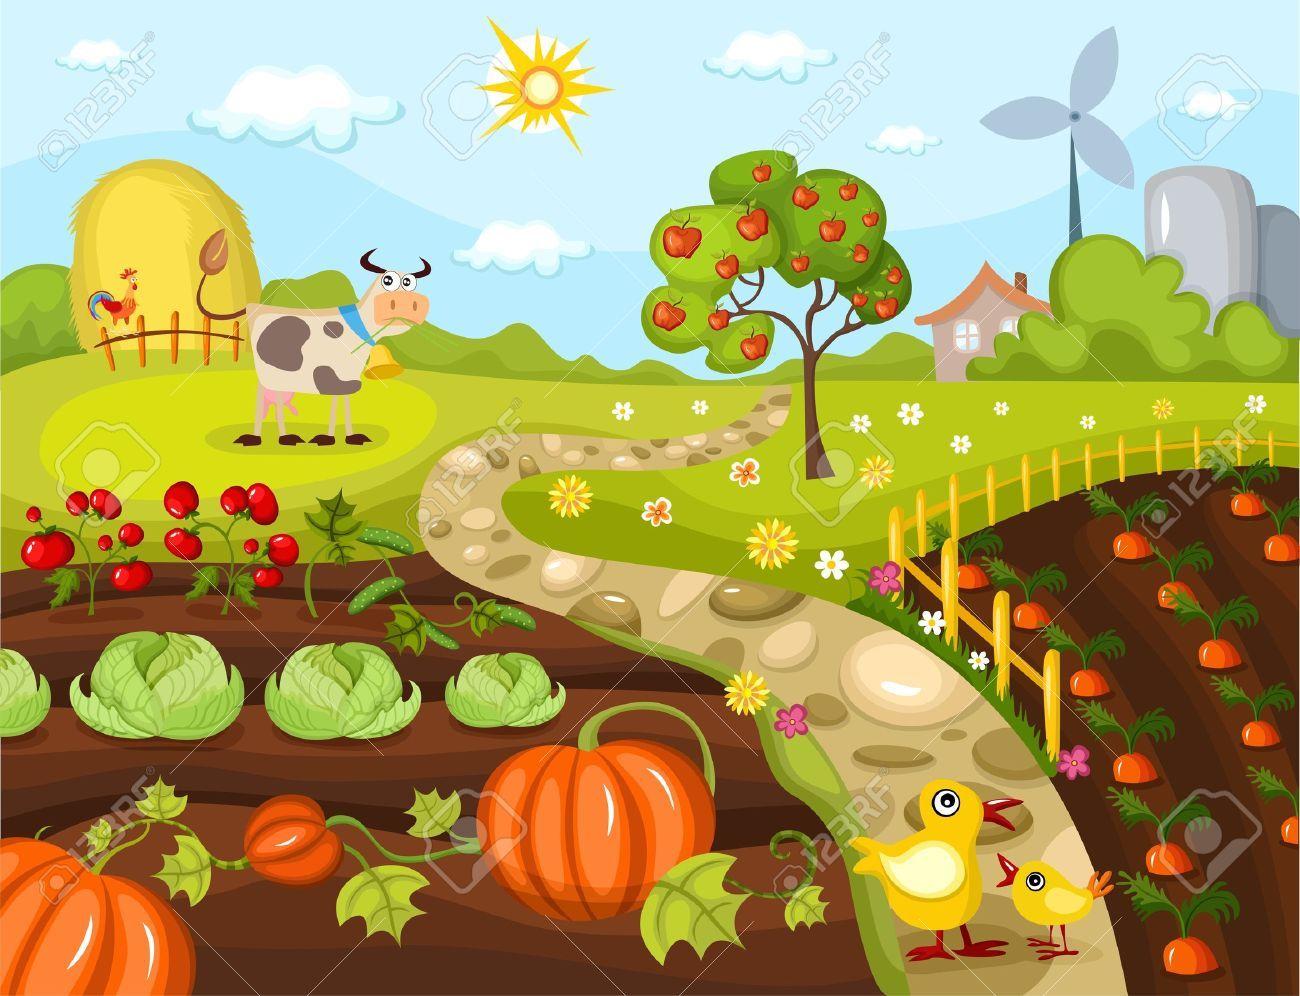 Farming clipart vegetable farm. Pin by grace gunawan